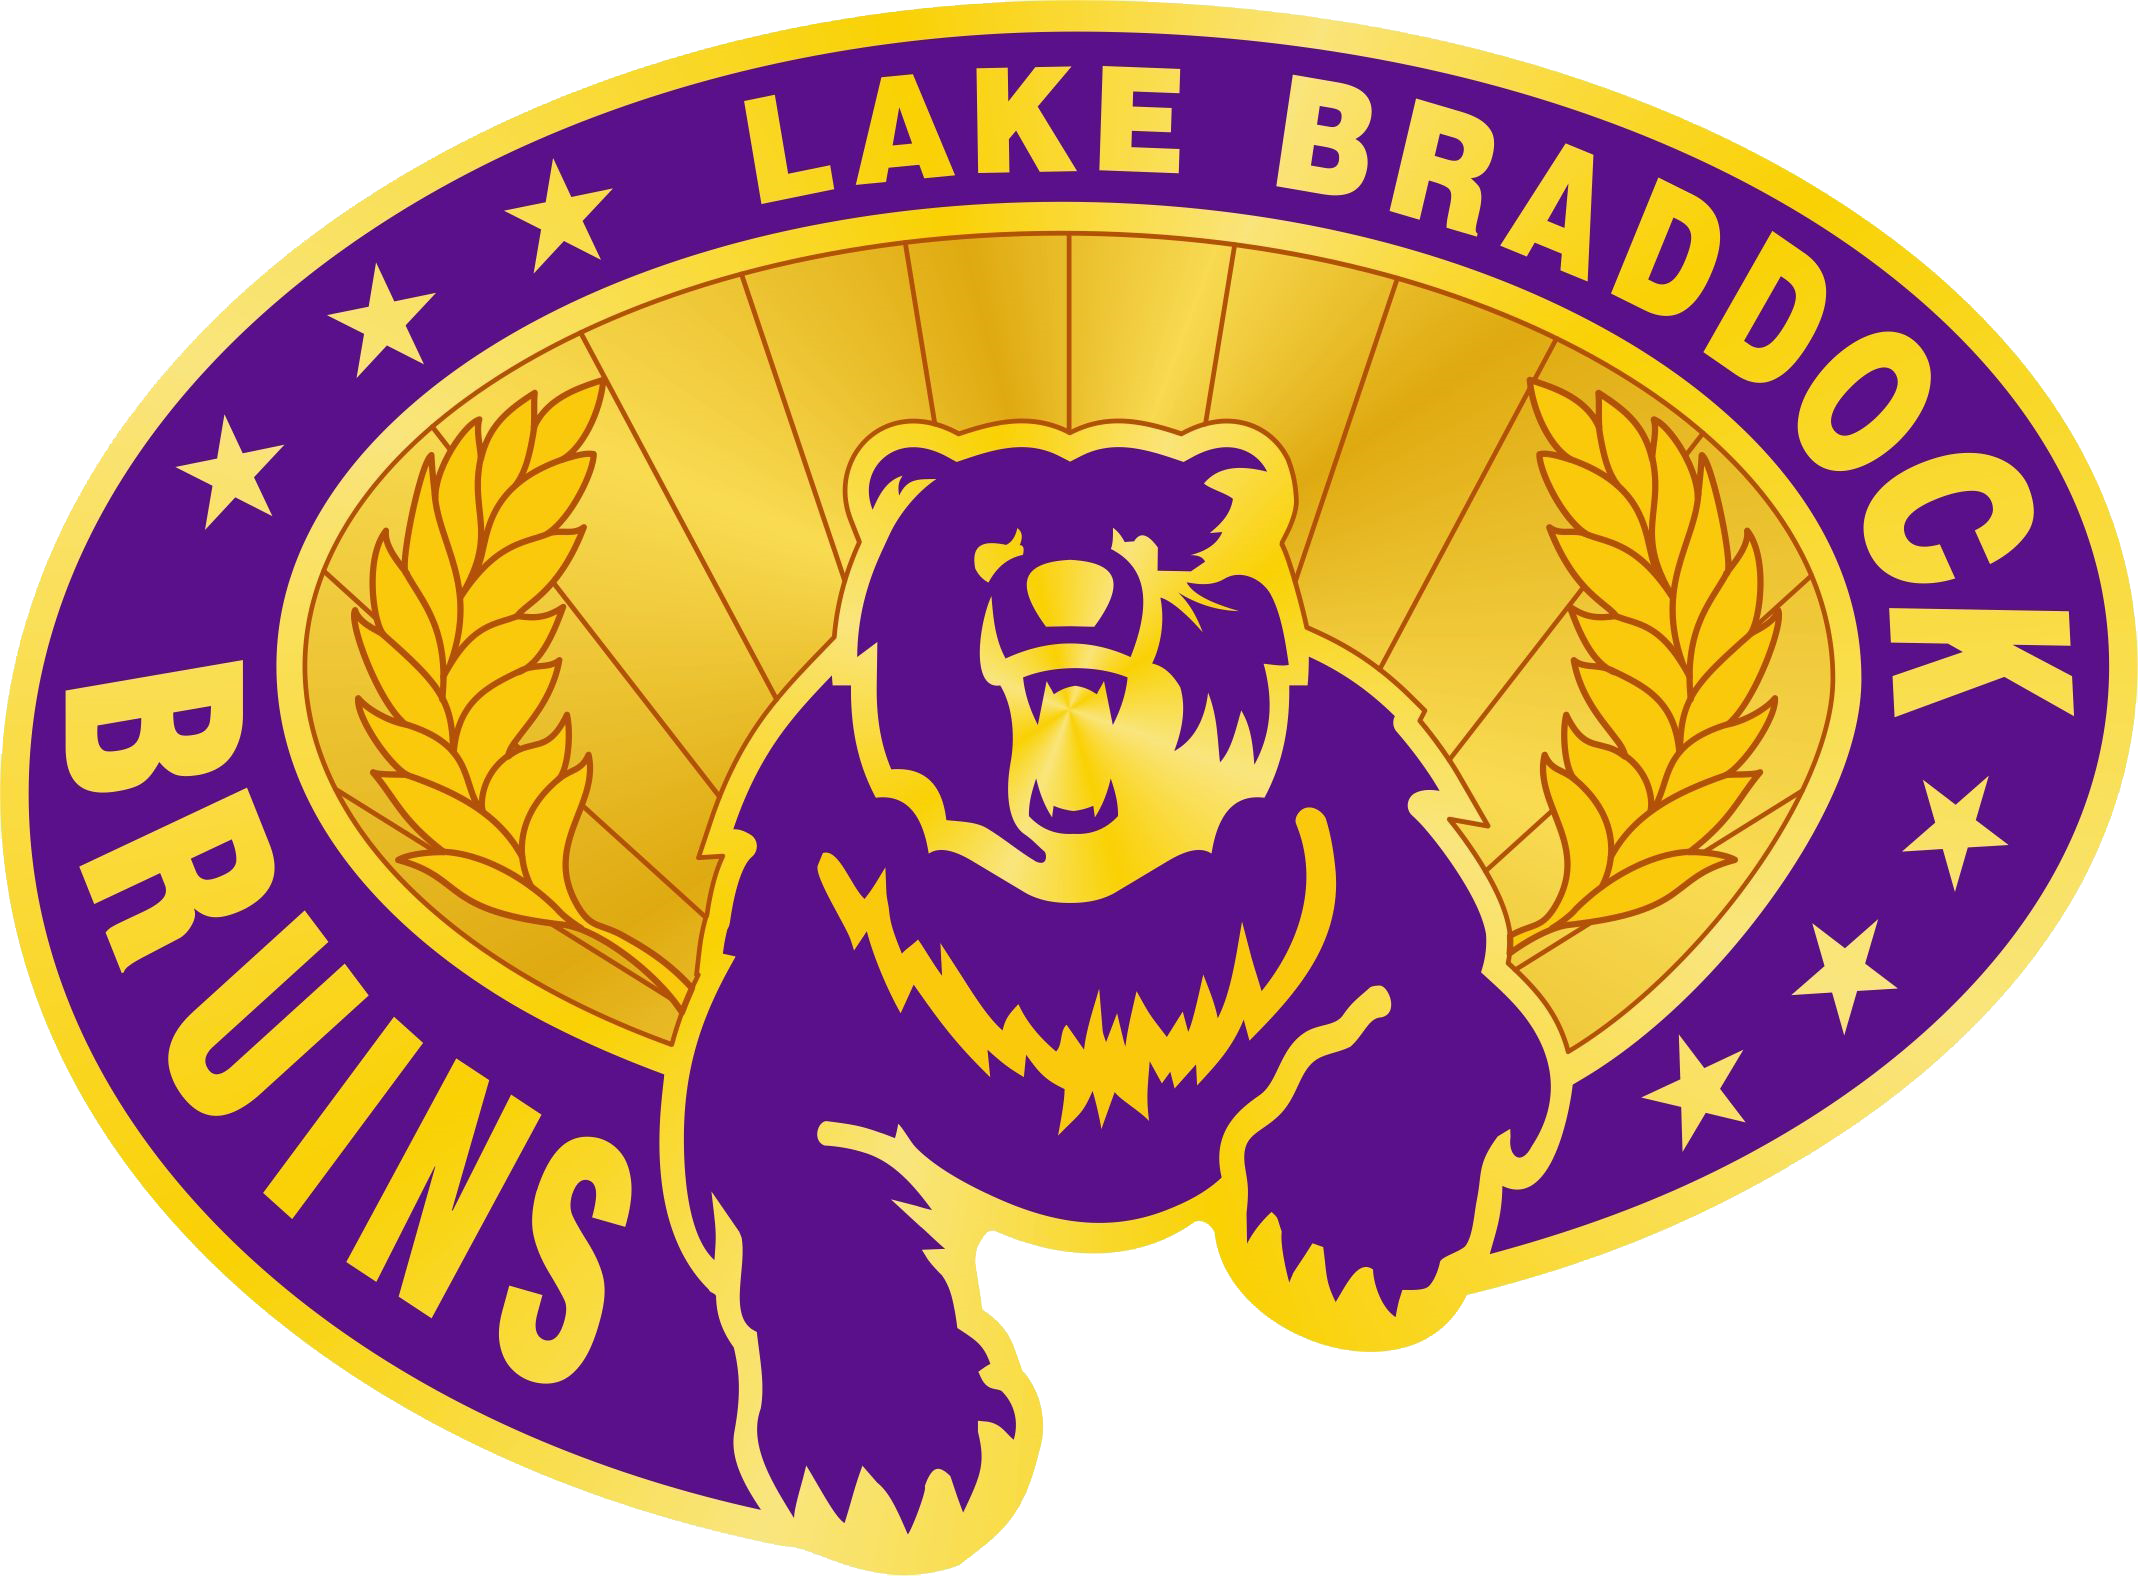 Lake Braddock Secondary School logo